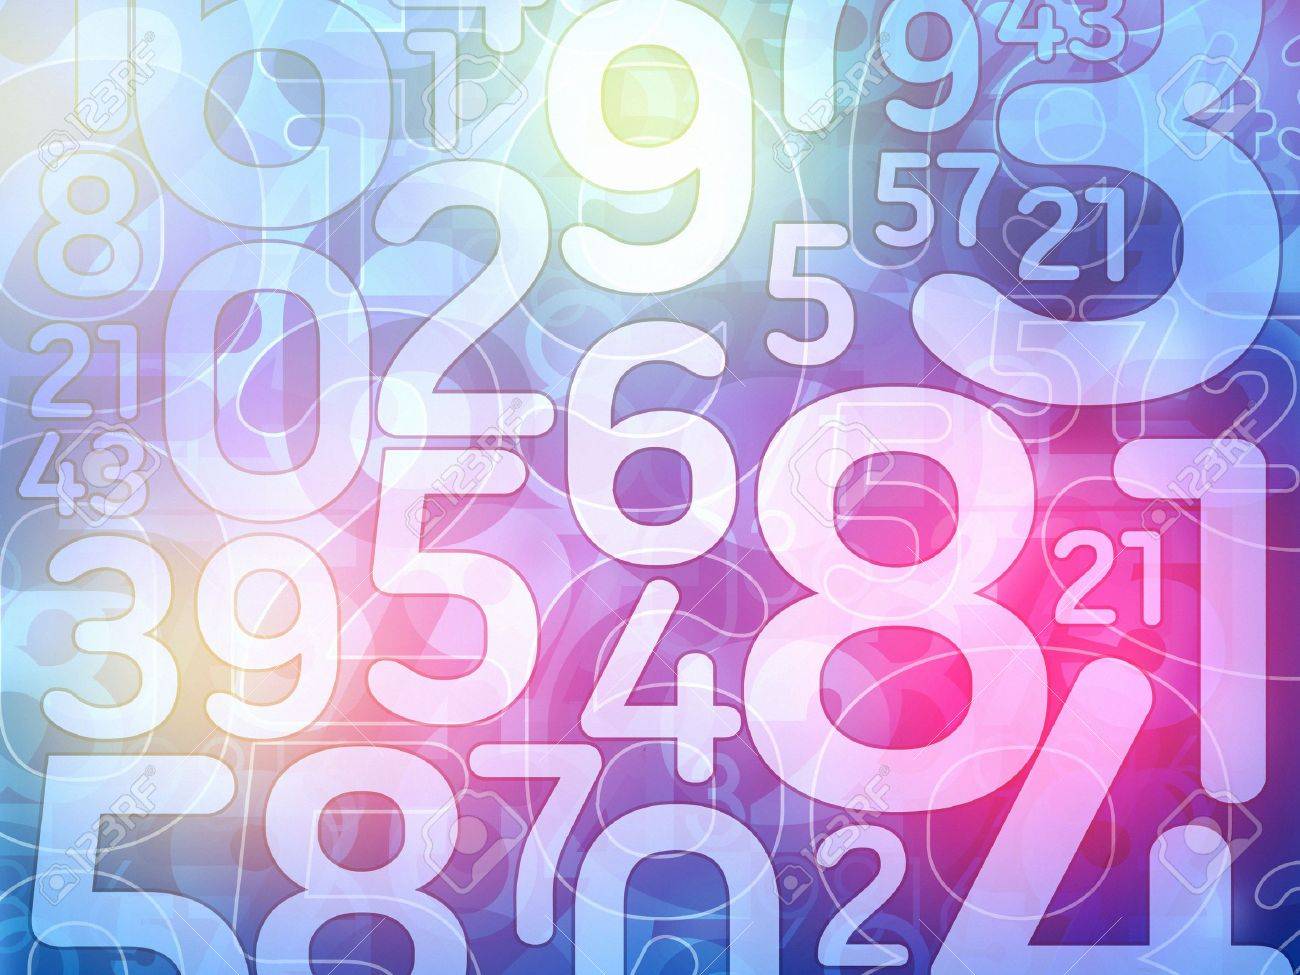 colorful random number math background illustration stock photo